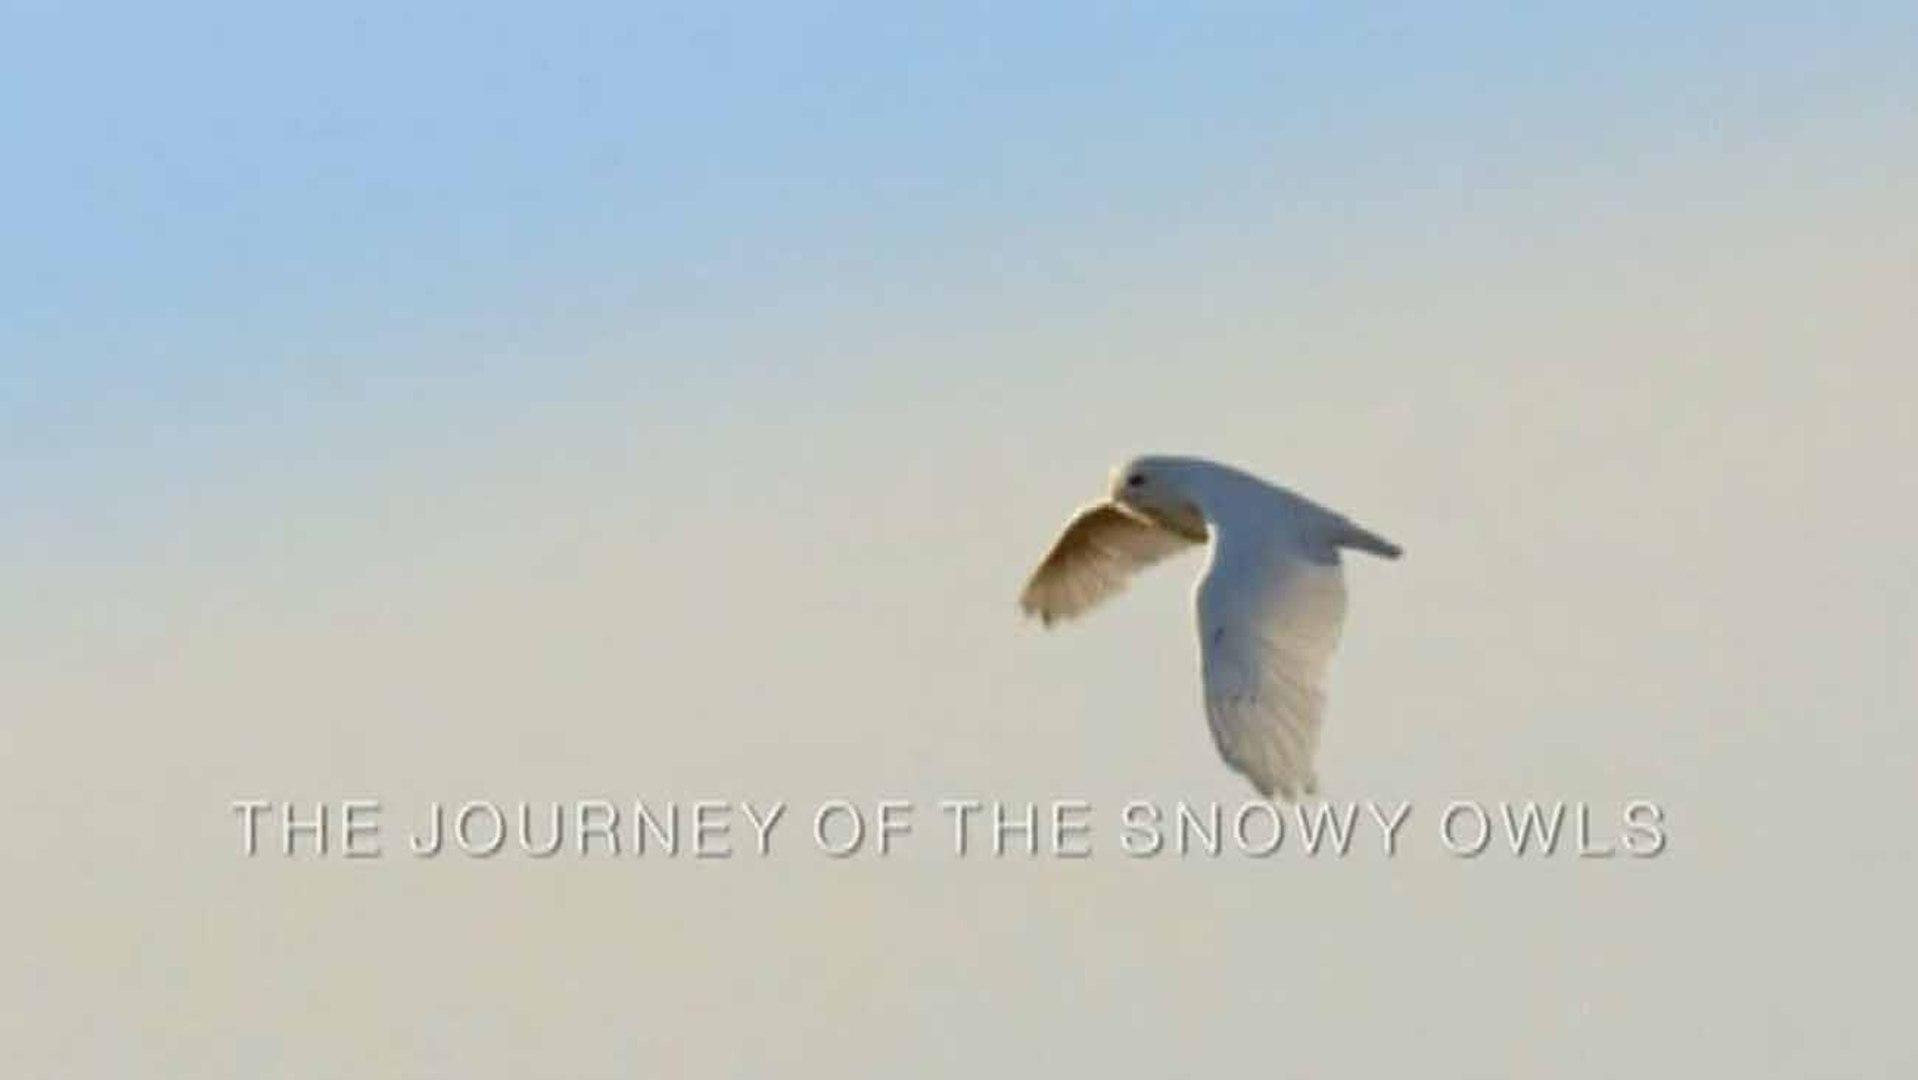 Зимняя сказка. Путешествие полярных сов / A winter's Tale: The Journey of the Snowy Owls (2015)